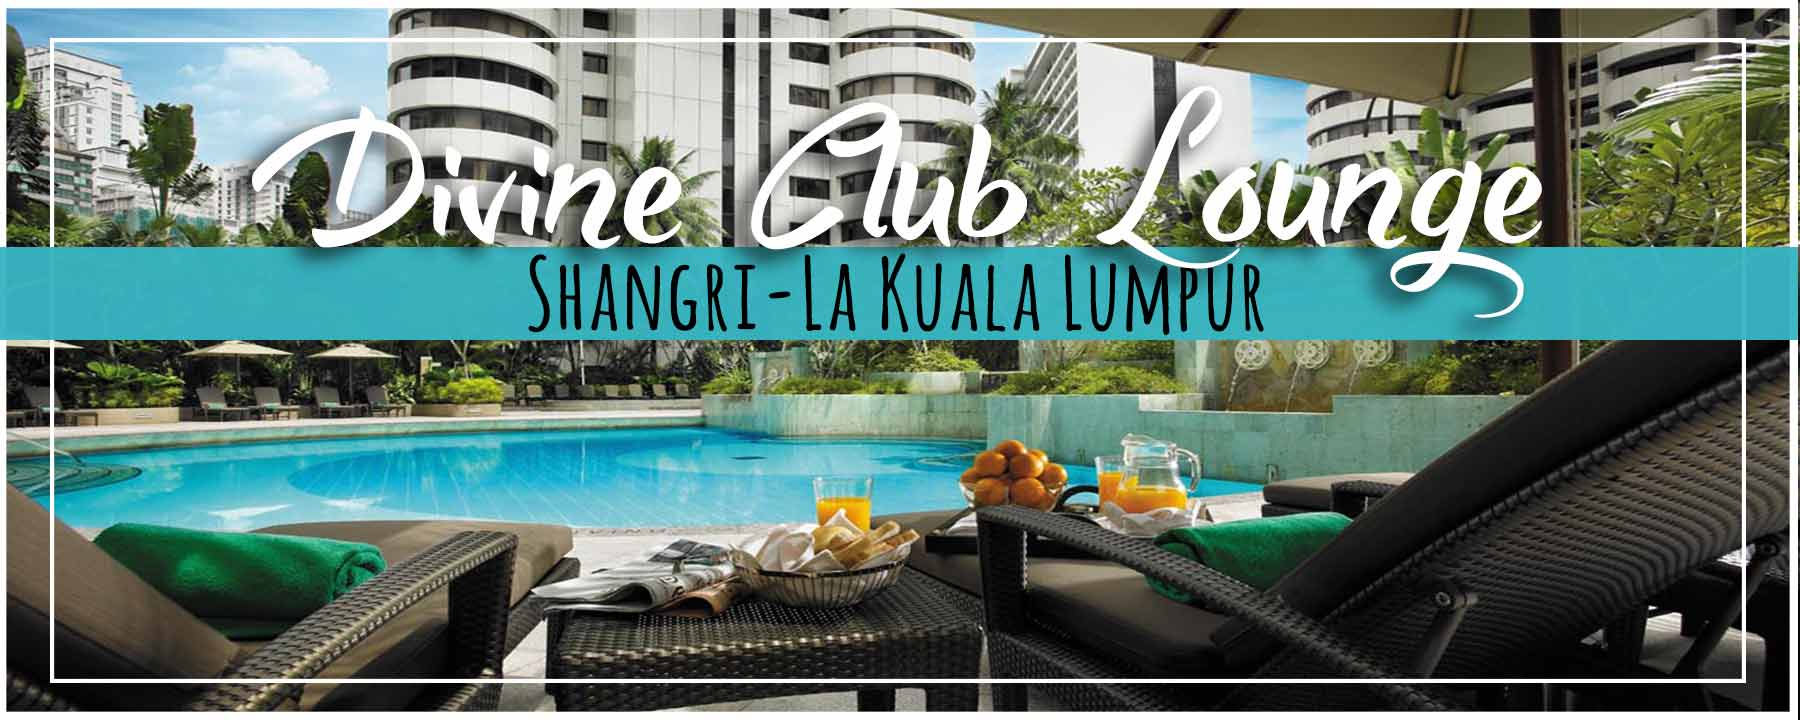 Shangri-La Kuala Lumpur Hotel | Amazing Club Lounge Experience